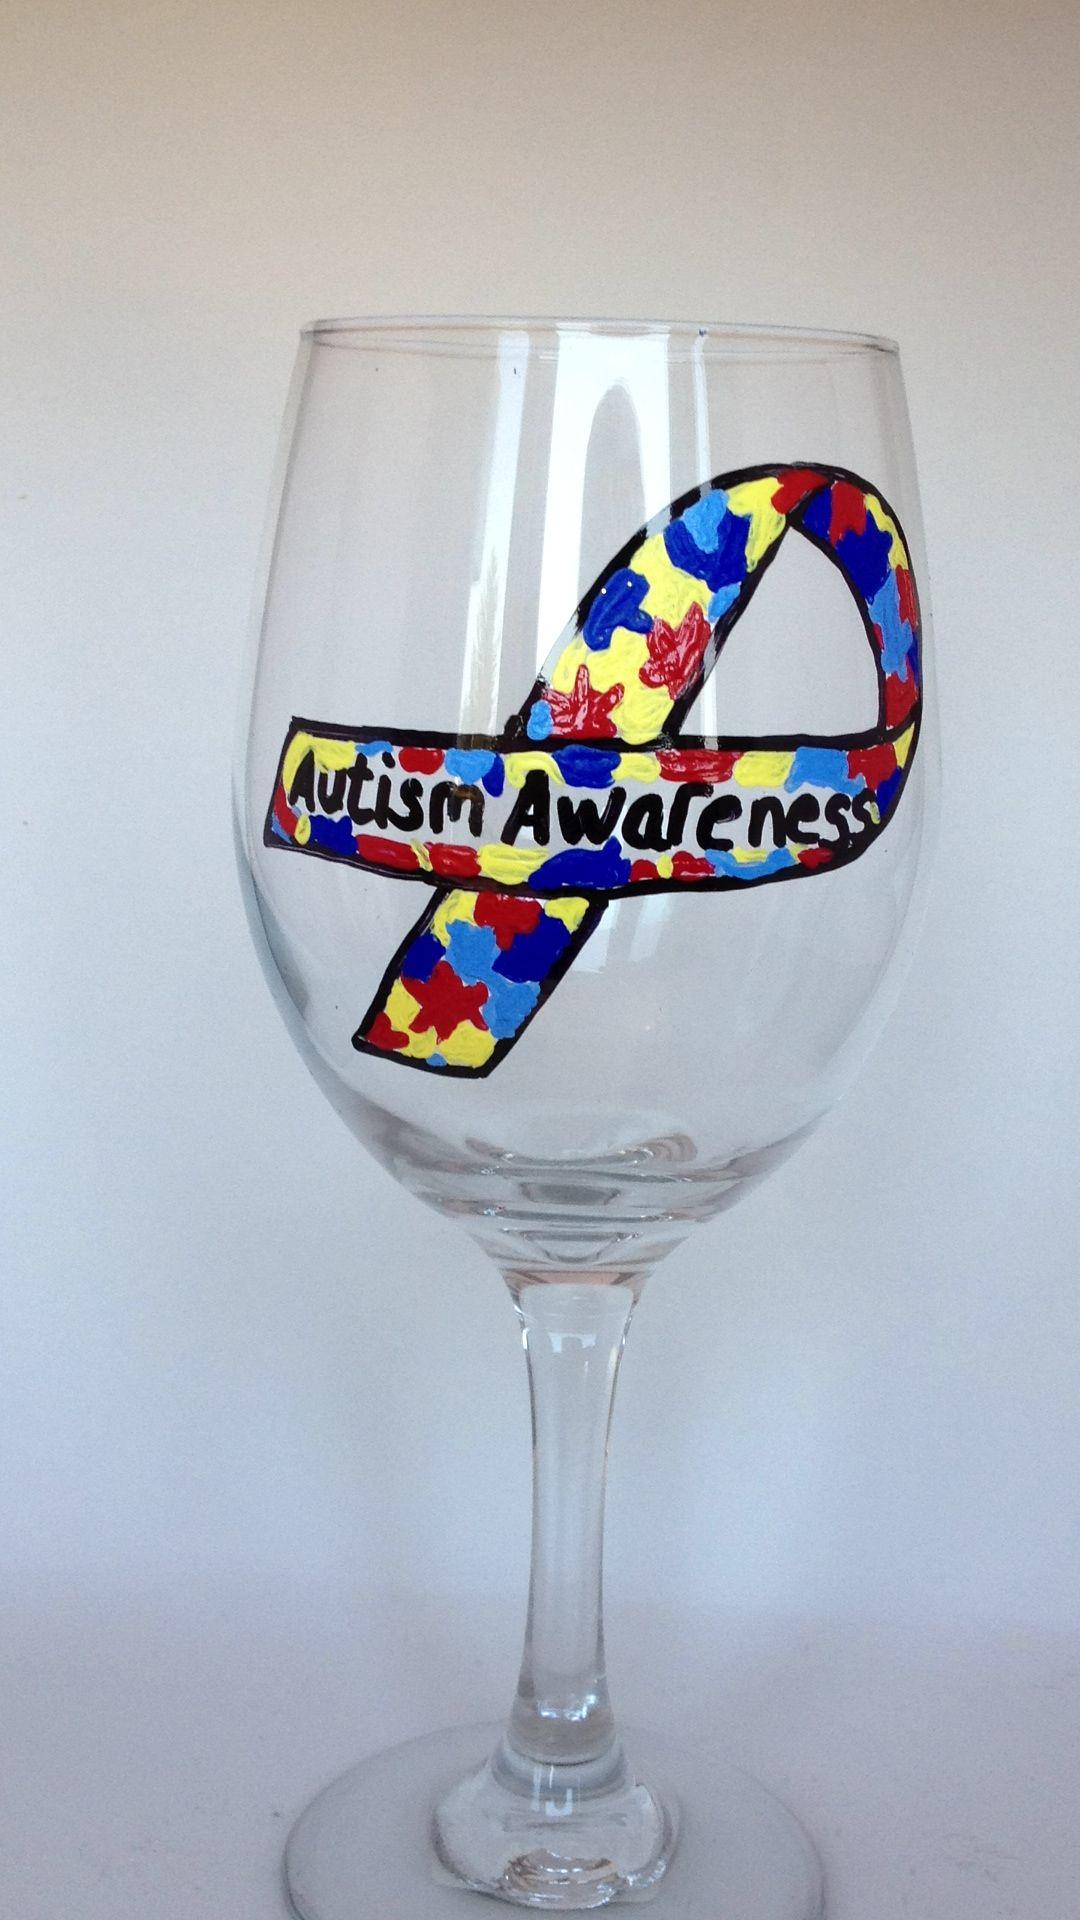 Autism awareness custom wine glass by  www.facebook.com/brusheswithaview